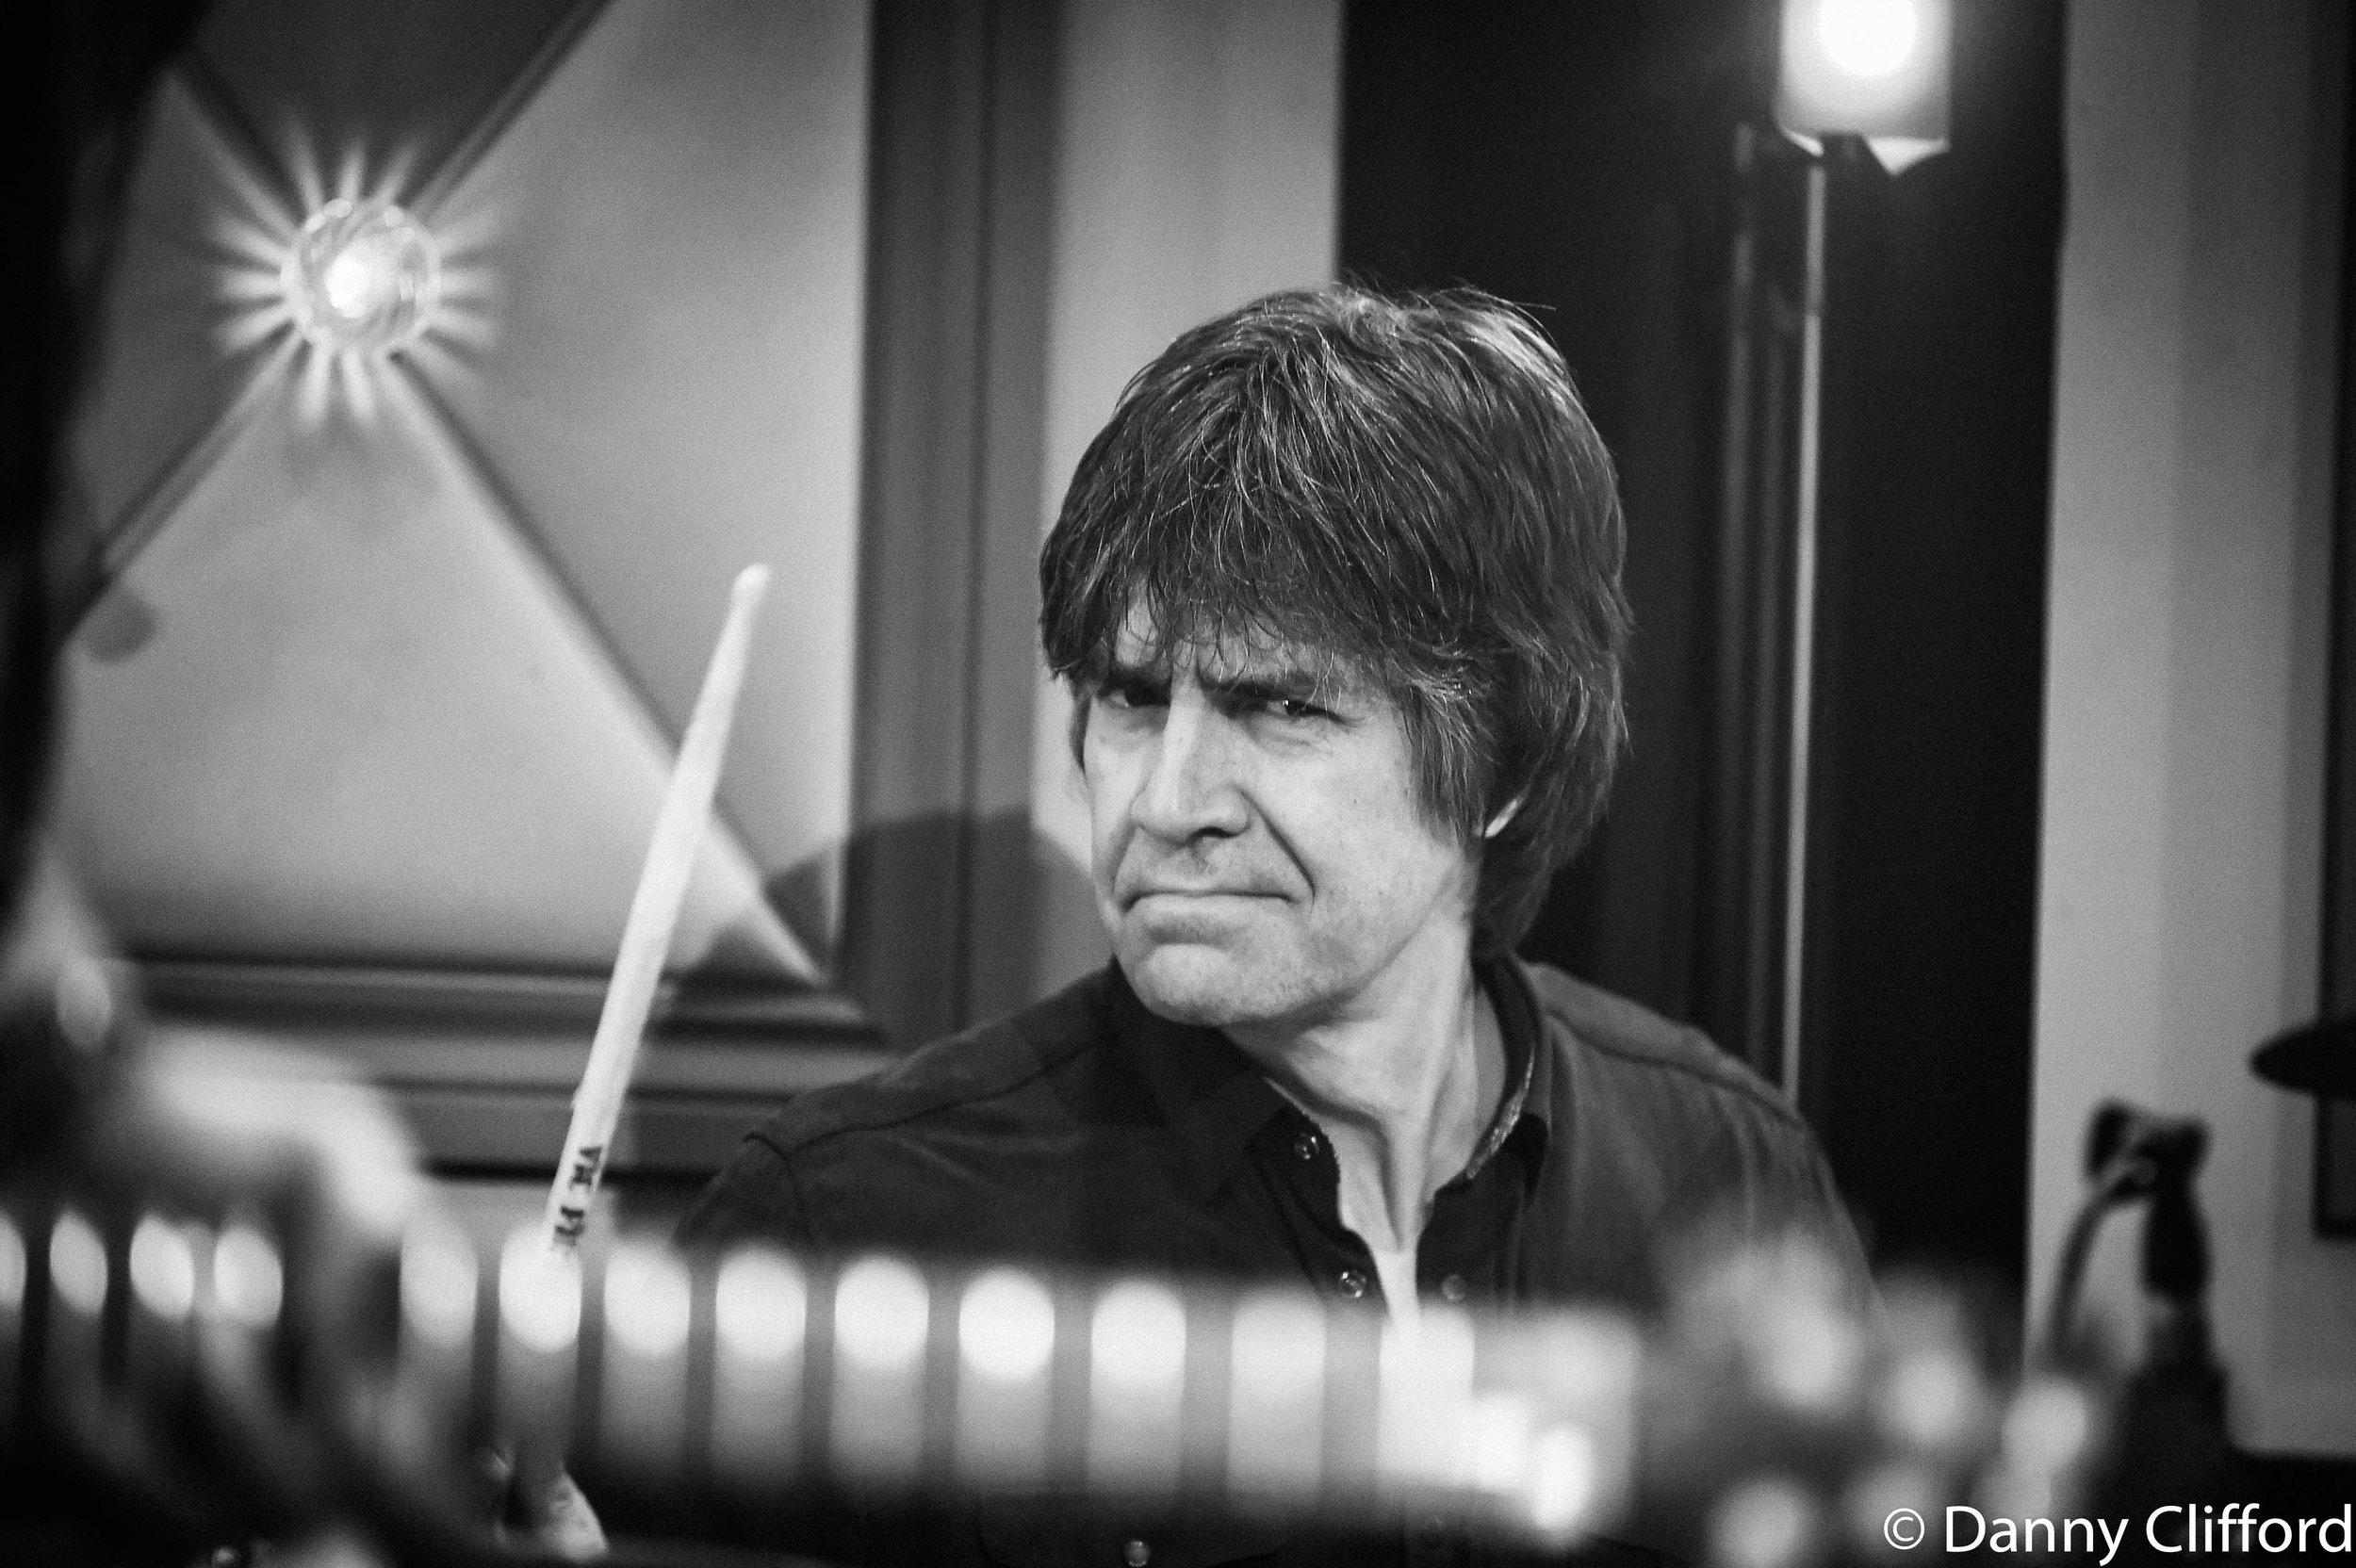 Mike Sturgess - Incredible drummer!